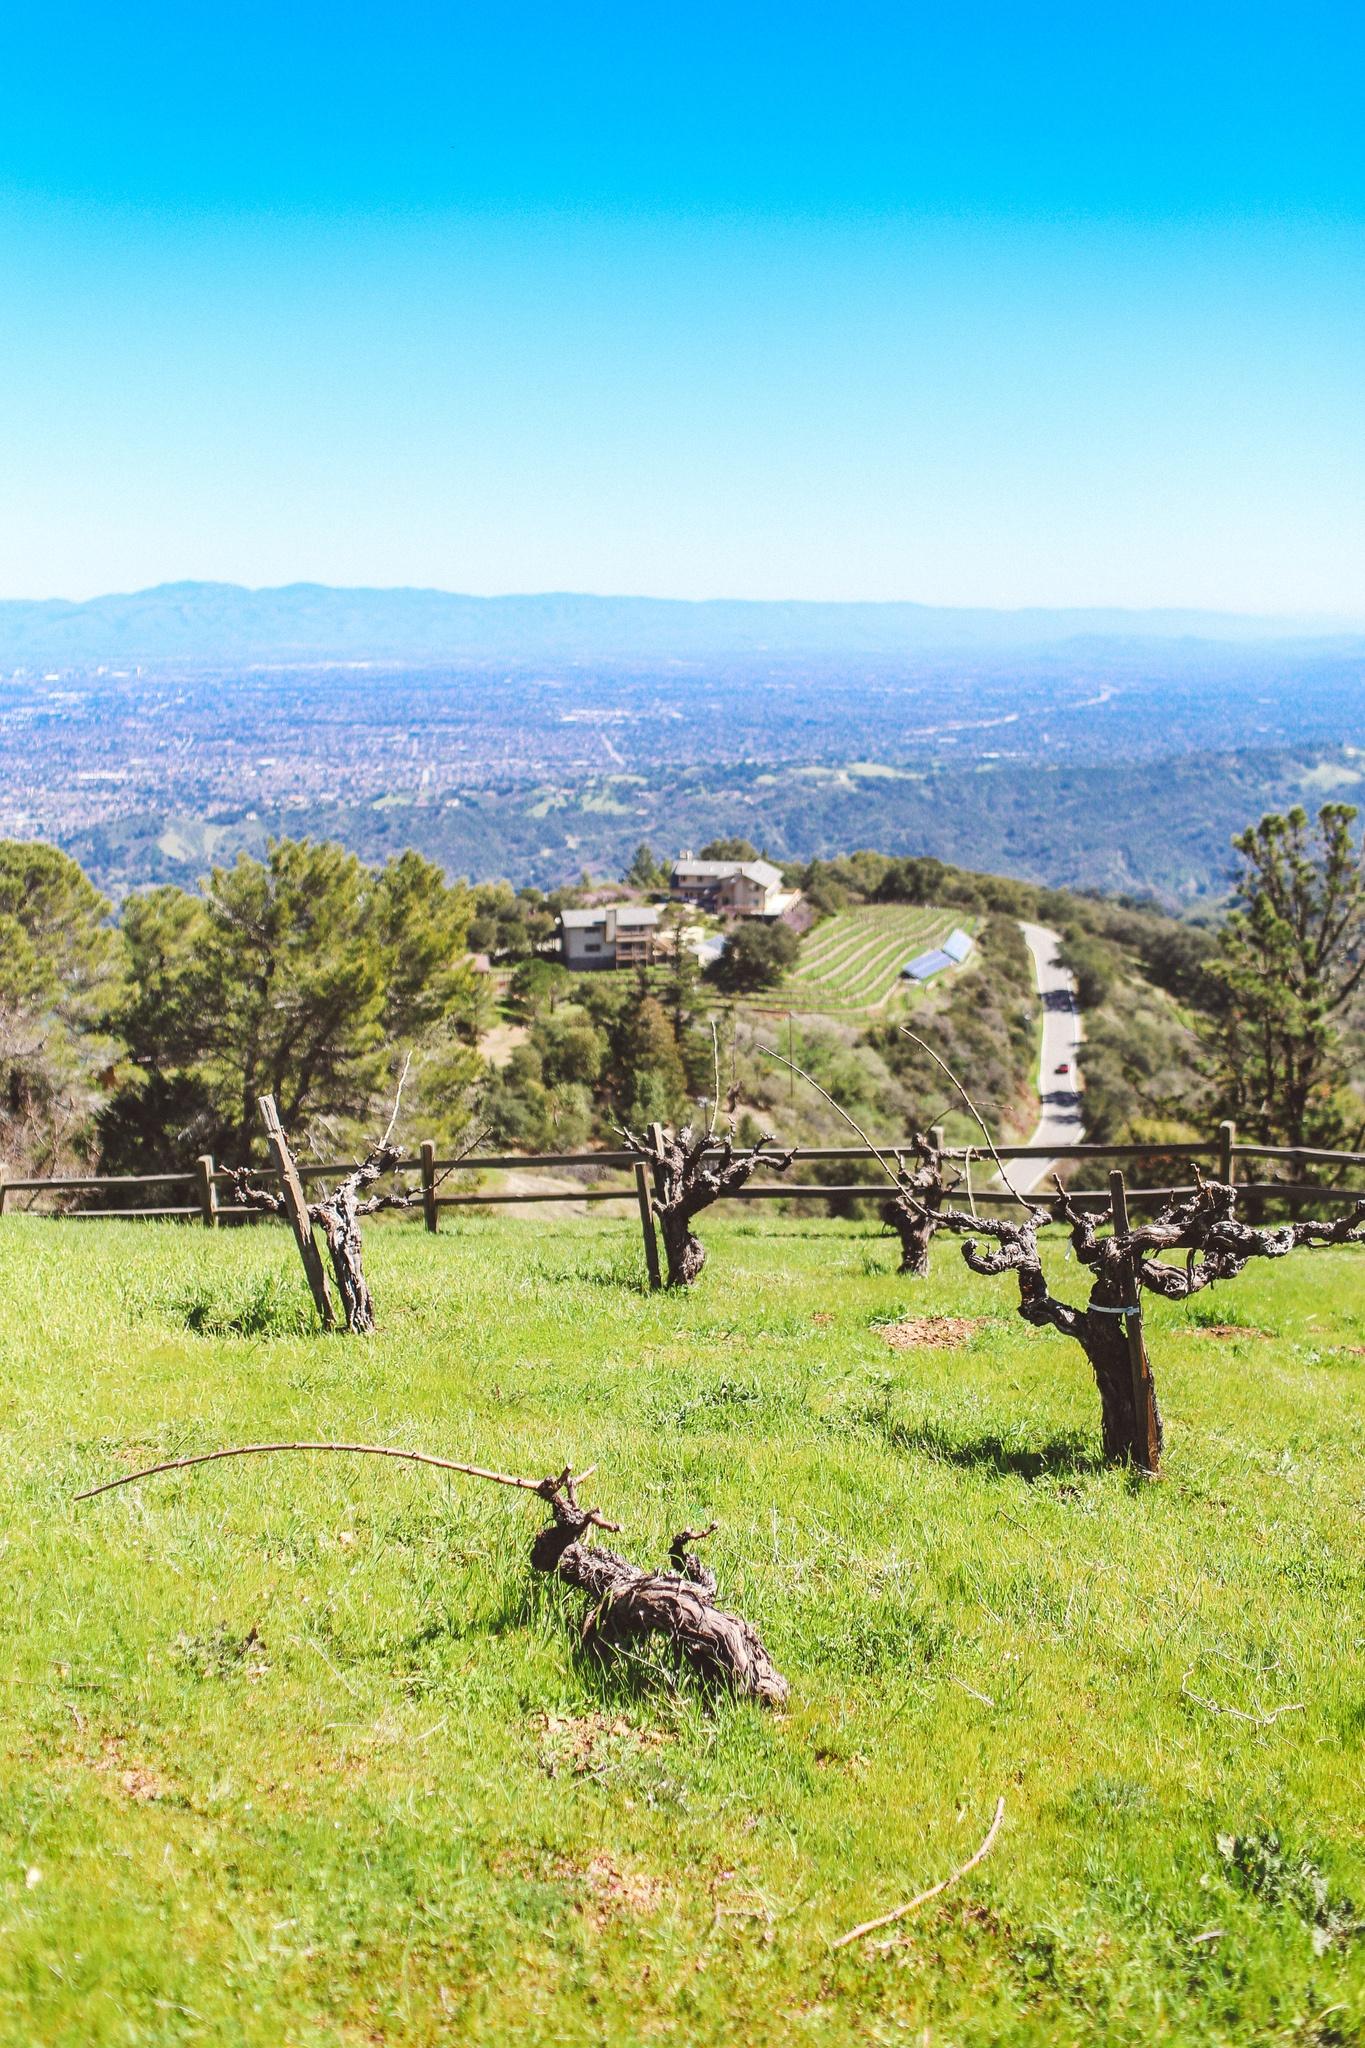 Incredible view at Ridge Winery in the Santa Cruz Mountains